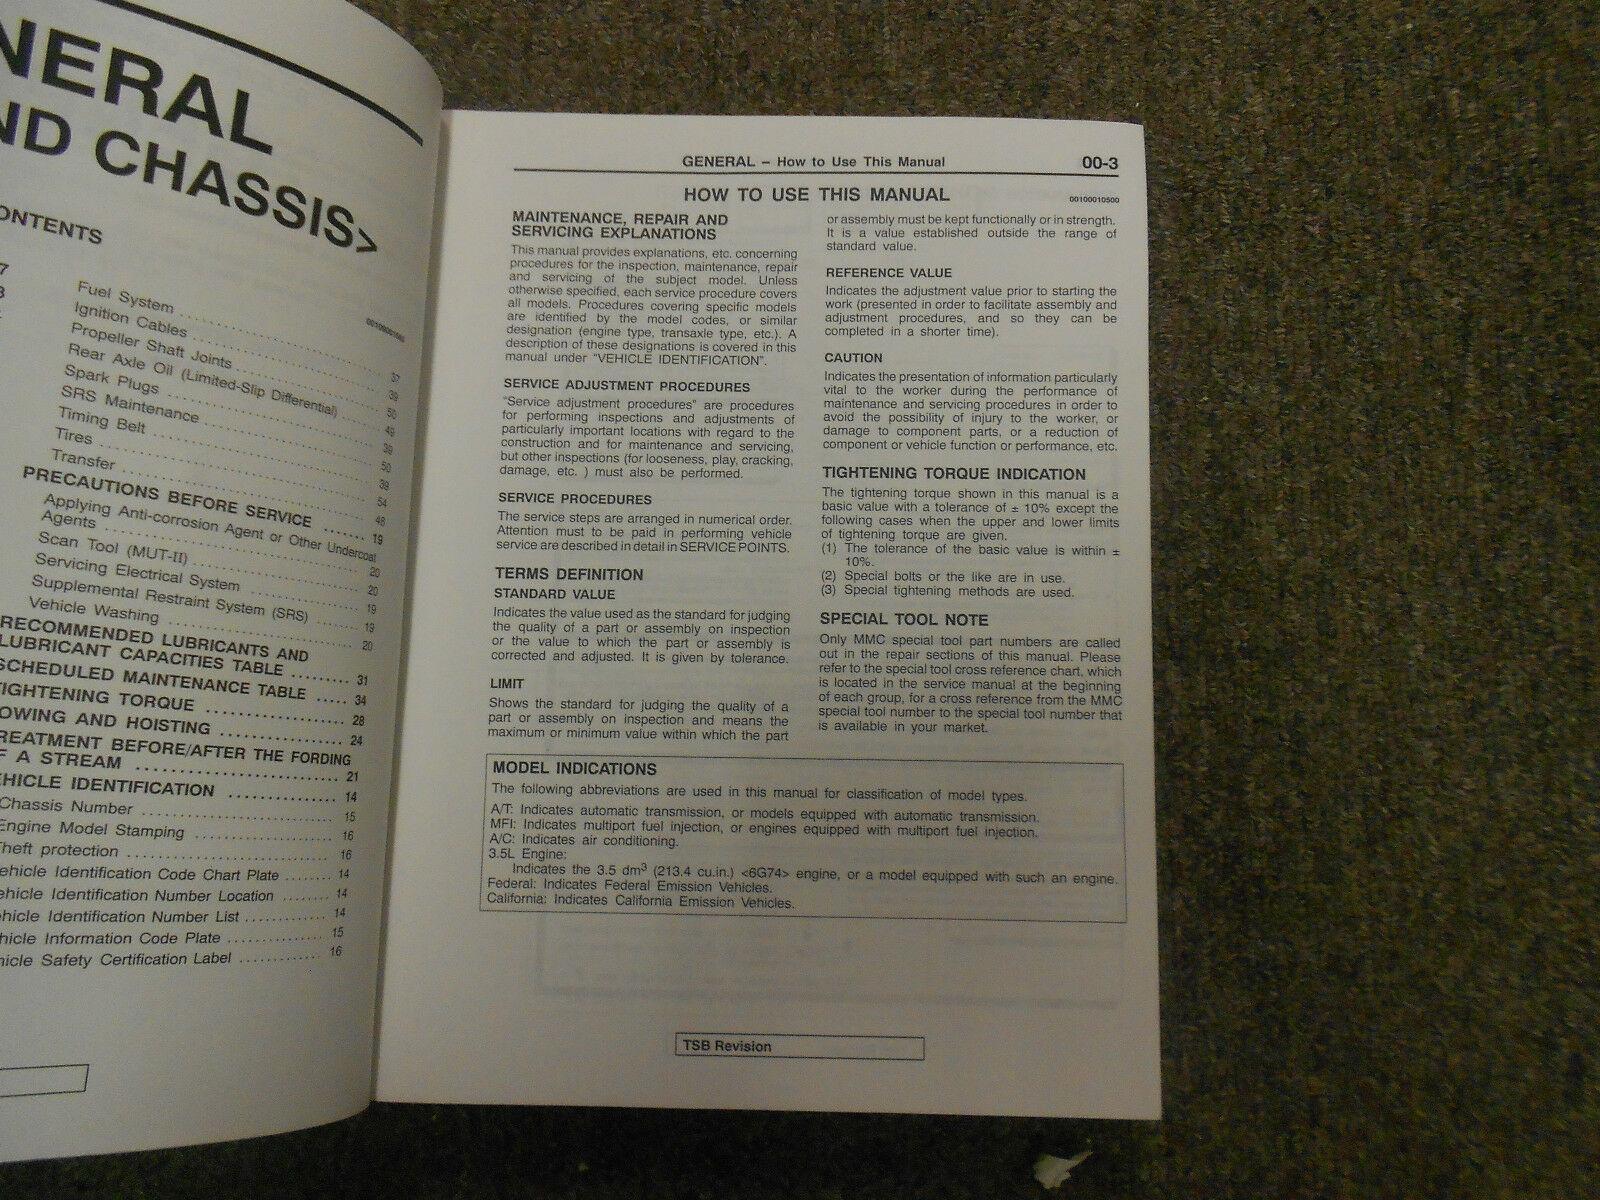 2000 MITSUBISHI Montero Shop Service Repair Manual Set FACTORY BOOKS FEO 00 x